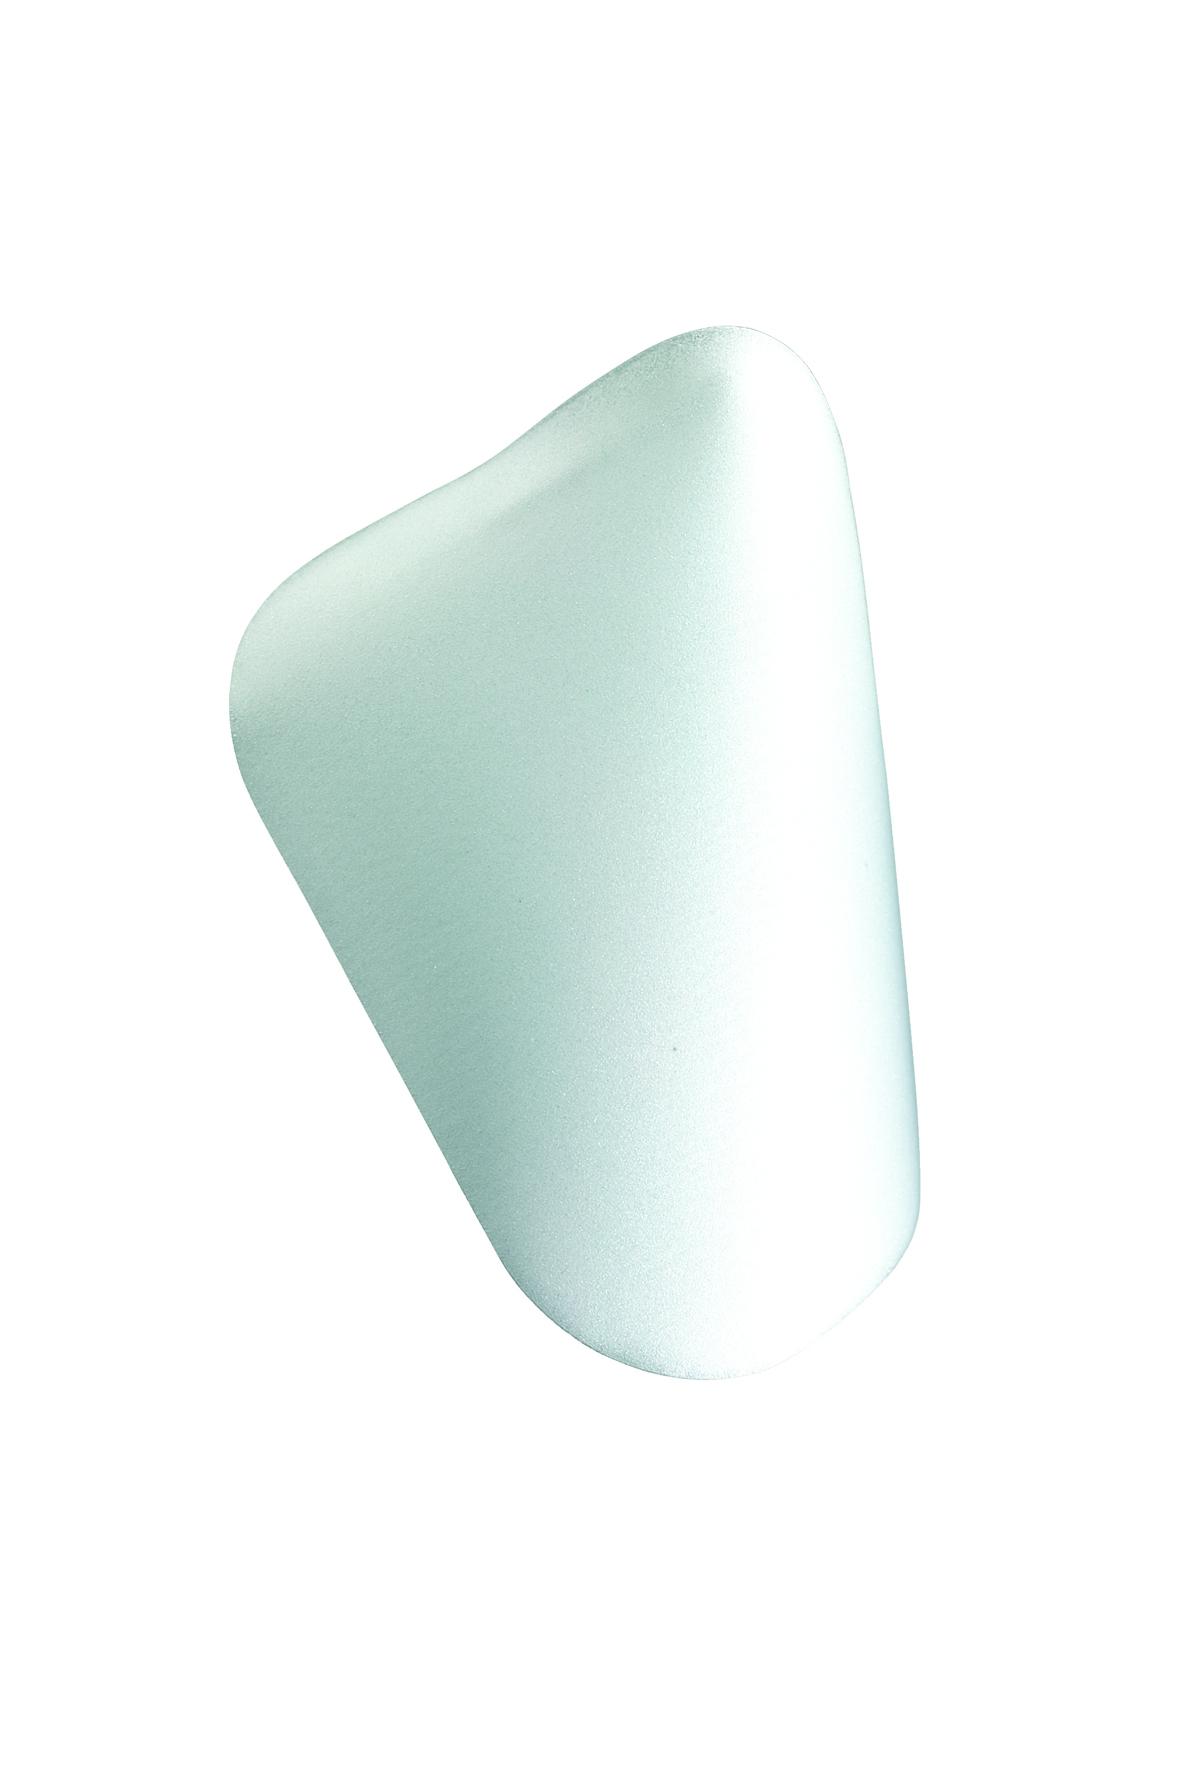 ALLEVYN Thin 10 x 10 cm - 5 Stück